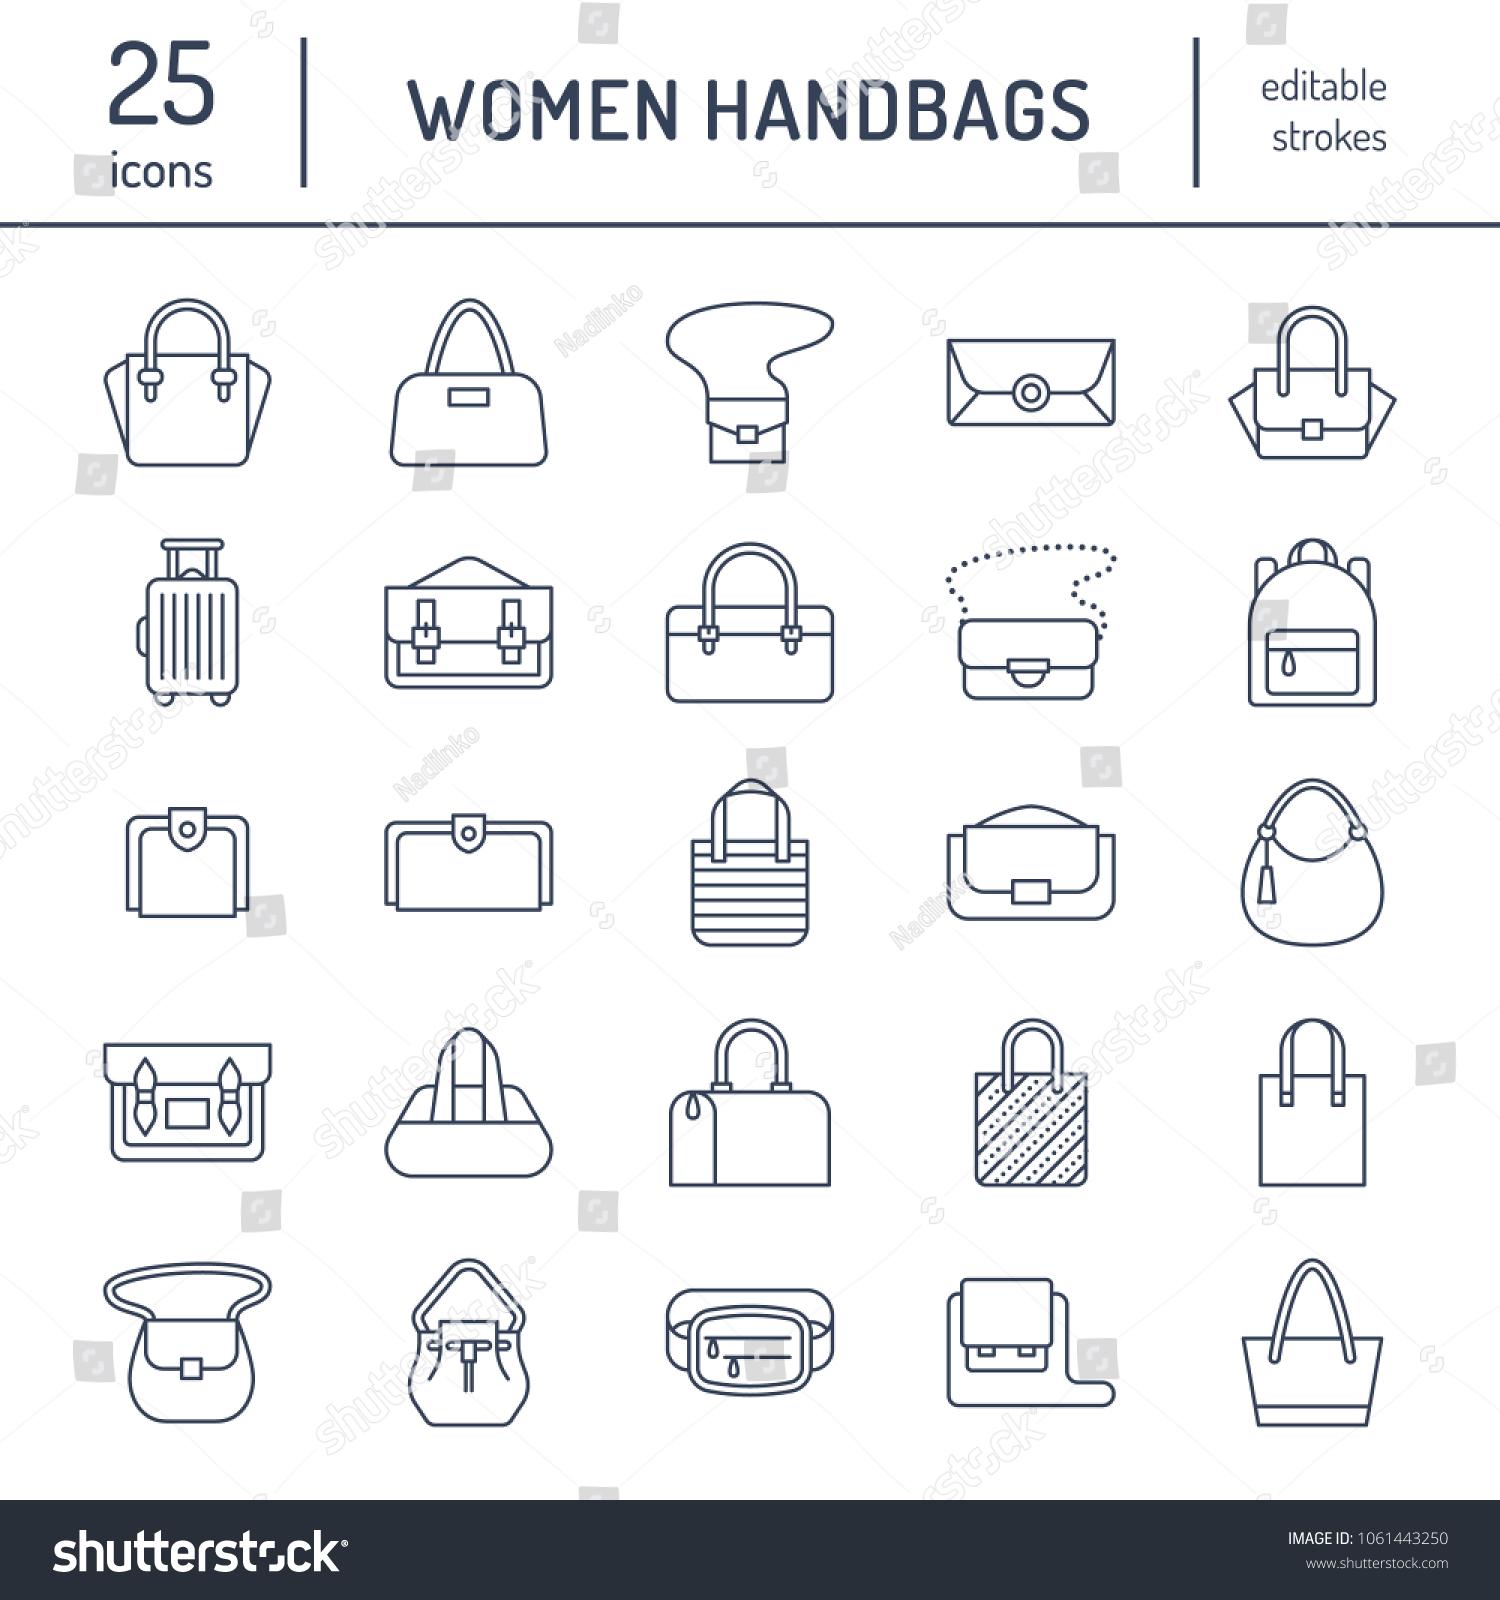 d560f7bac0 Women Handbags Flat Line Icons Bags Stock Vector (Royalty Free ...